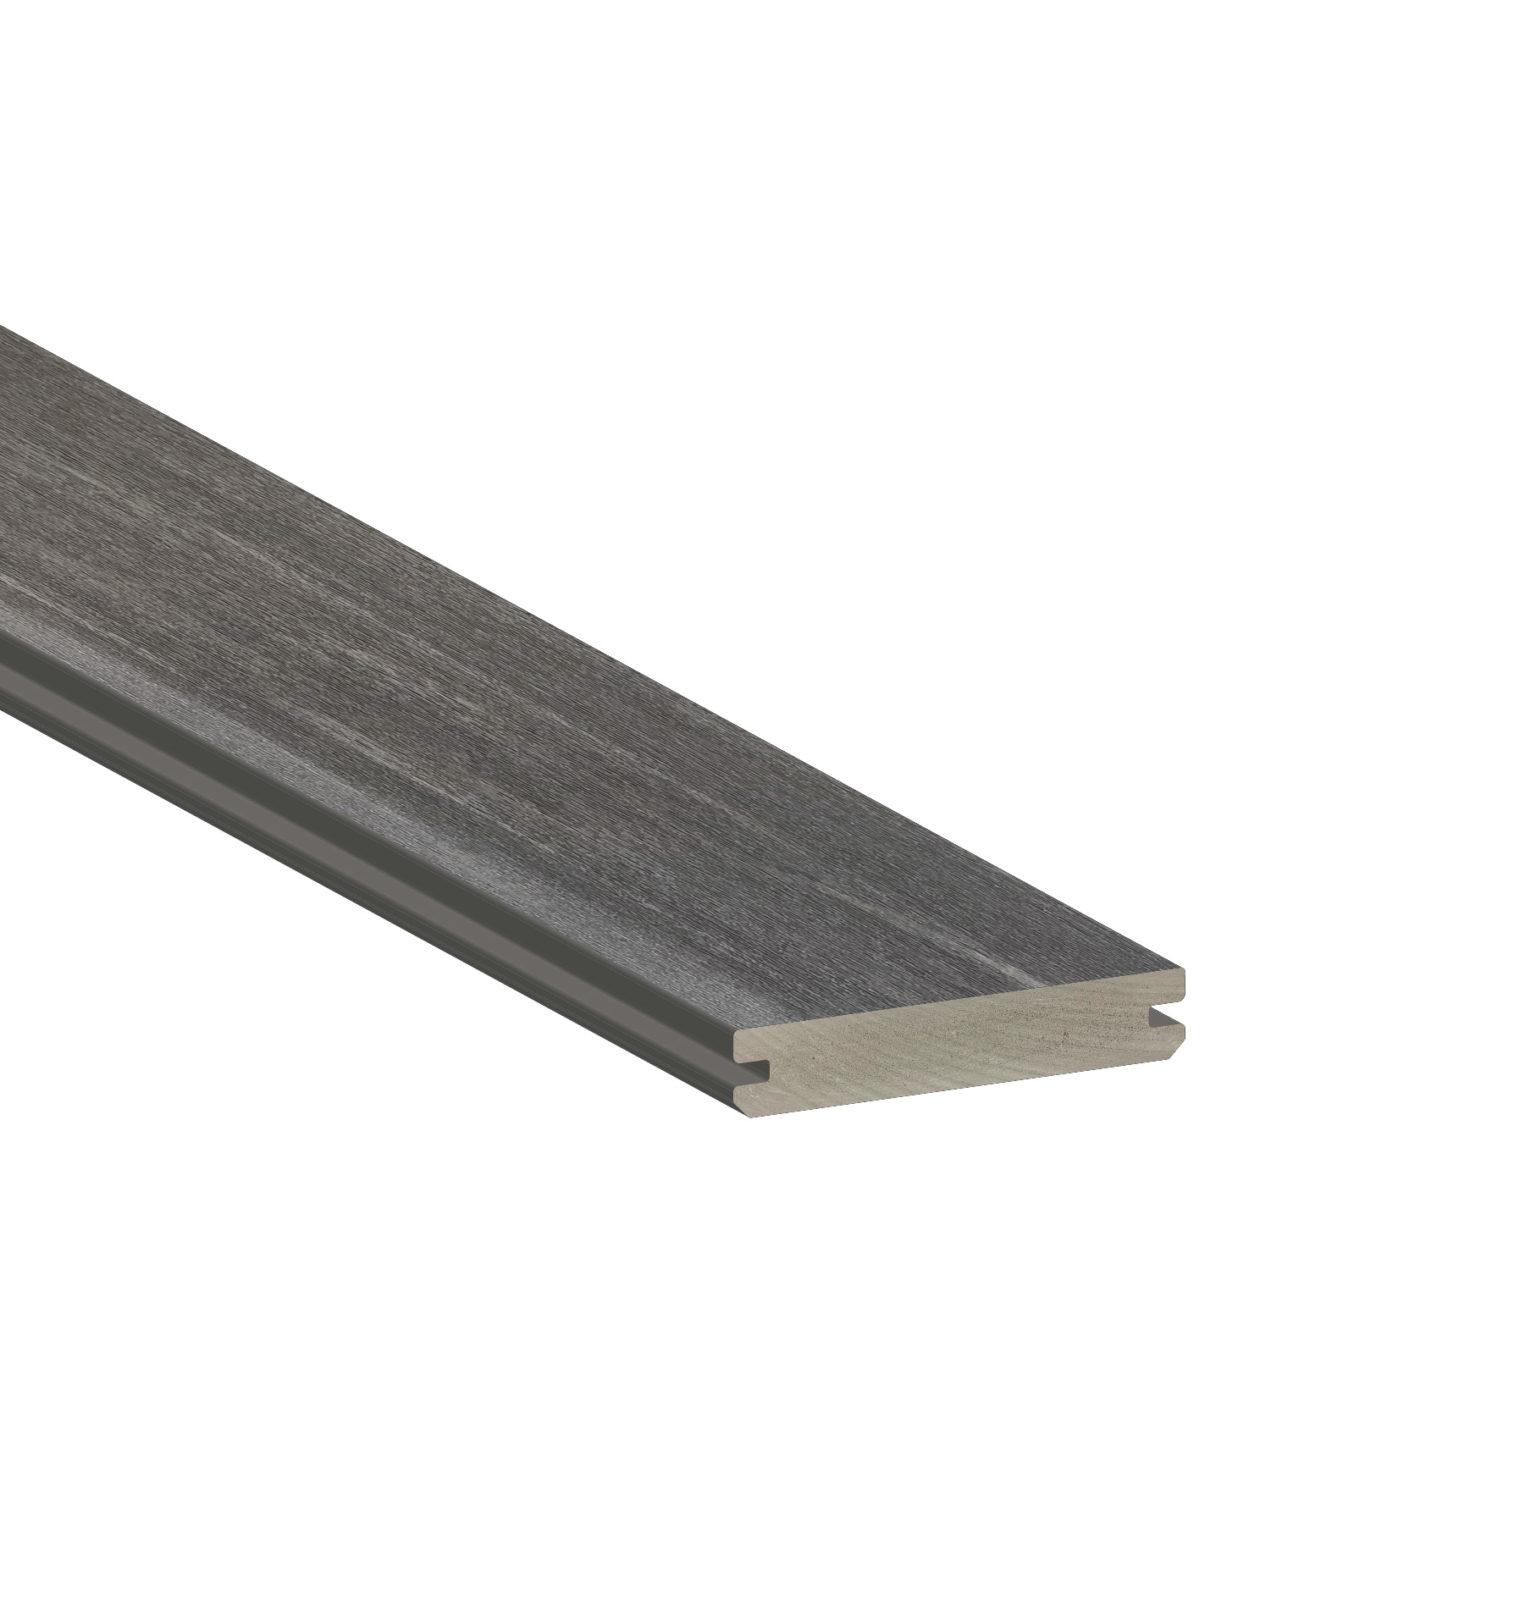 dark hickory board grooved edge